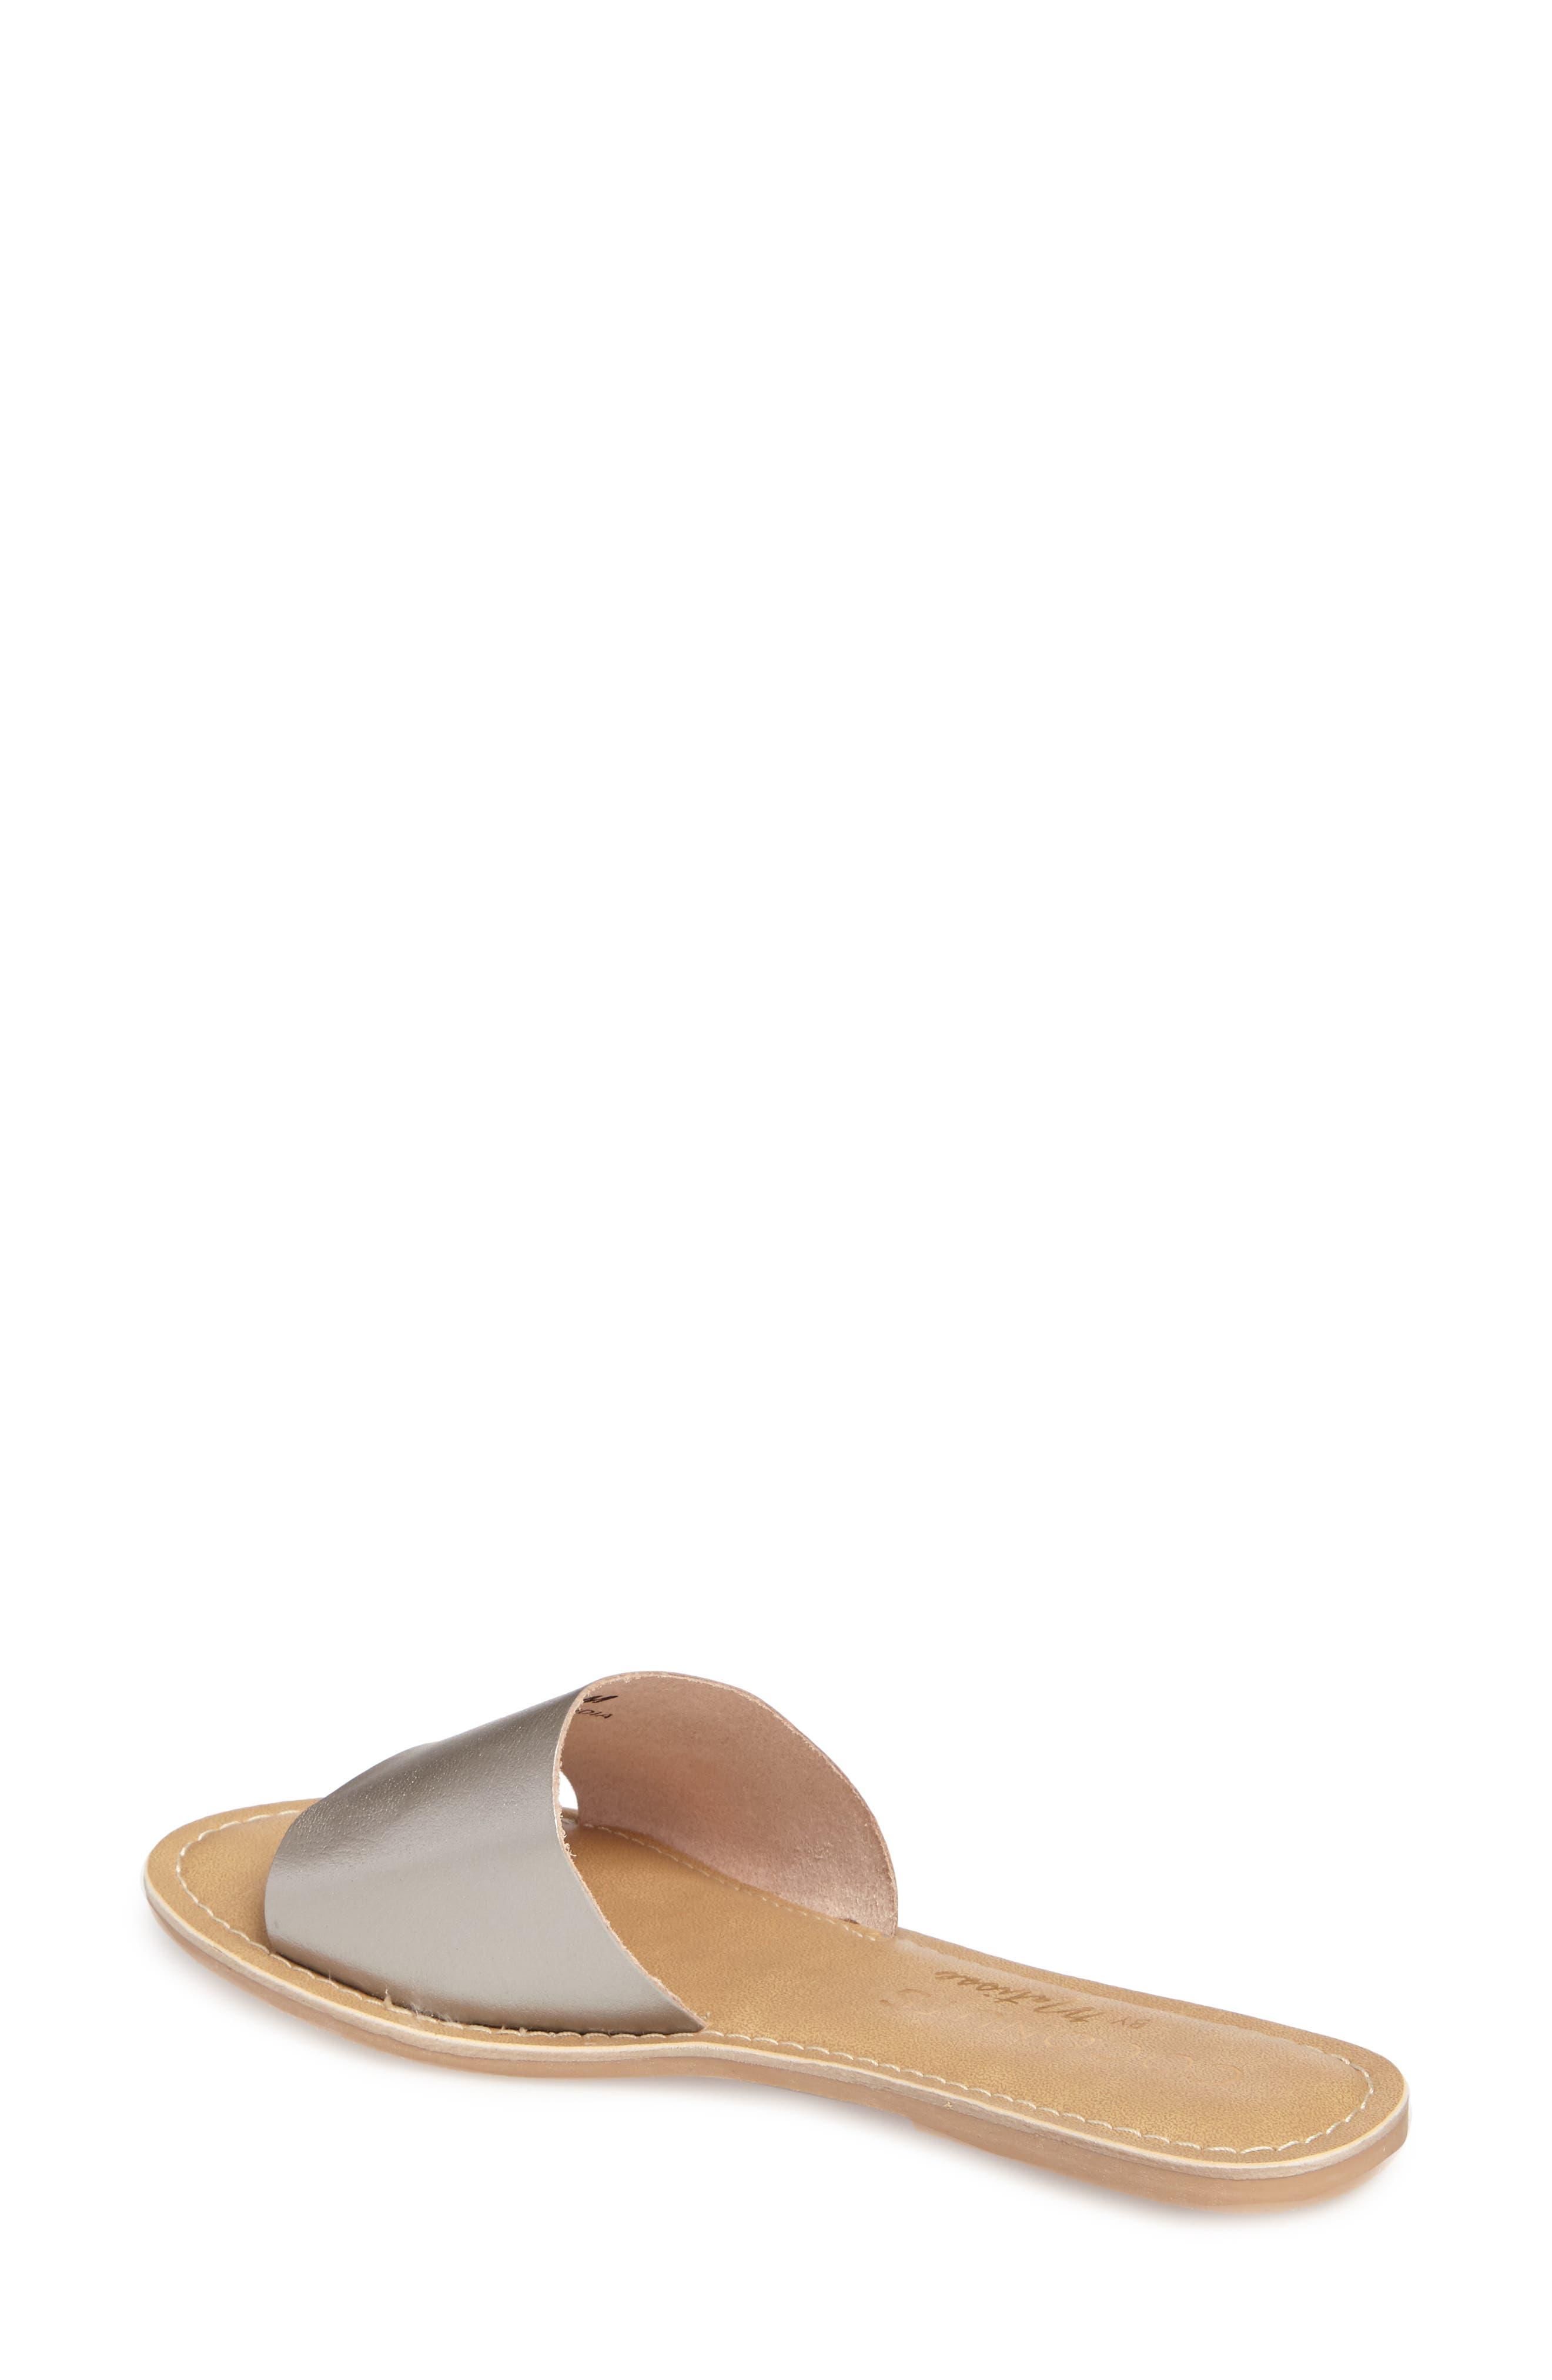 Cabana Slide Sandal,                             Alternate thumbnail 2, color,                             Ice Leather